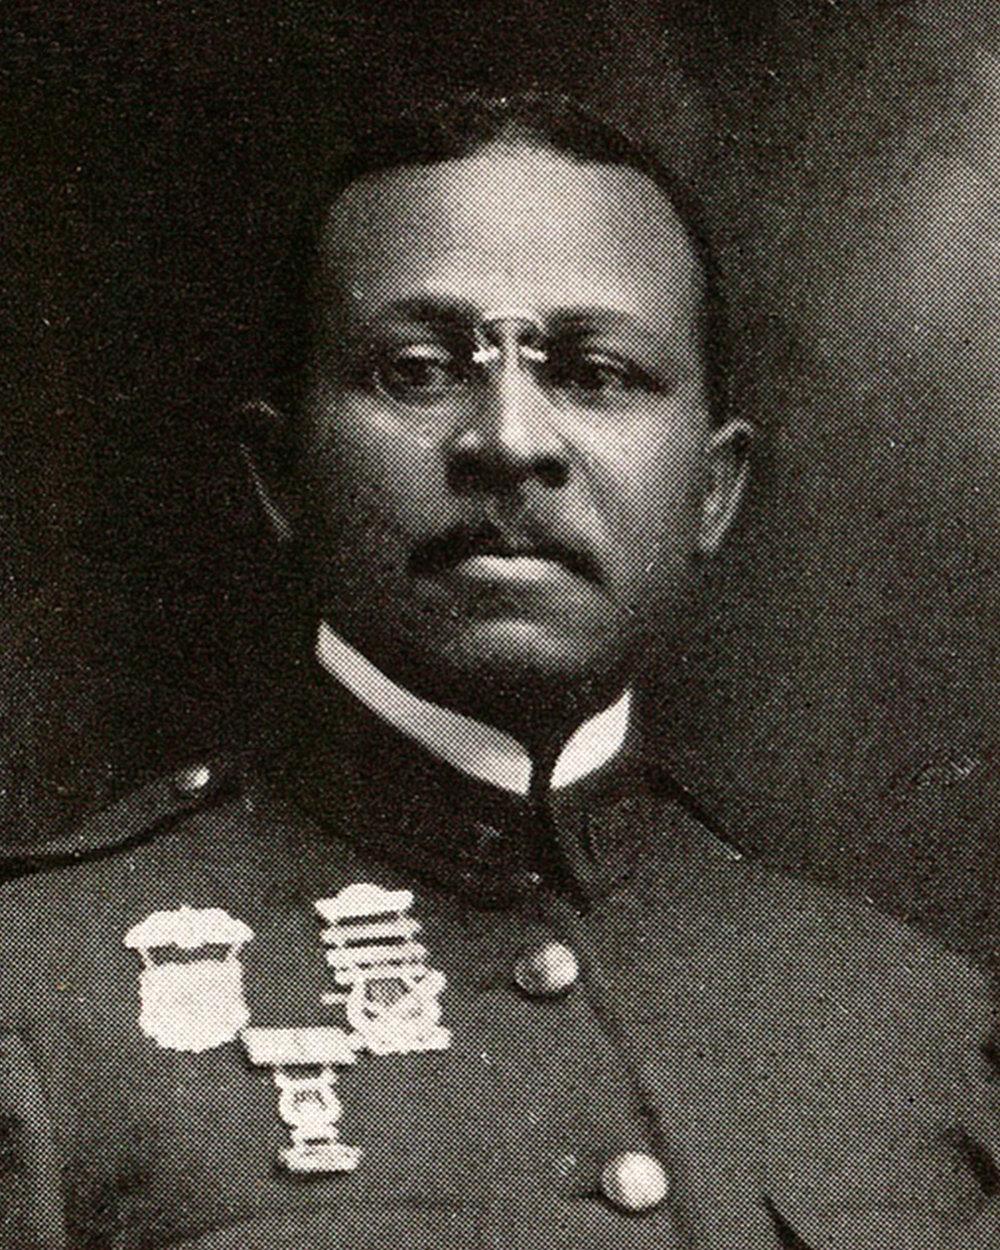 Copy of Major N. Clark Smith